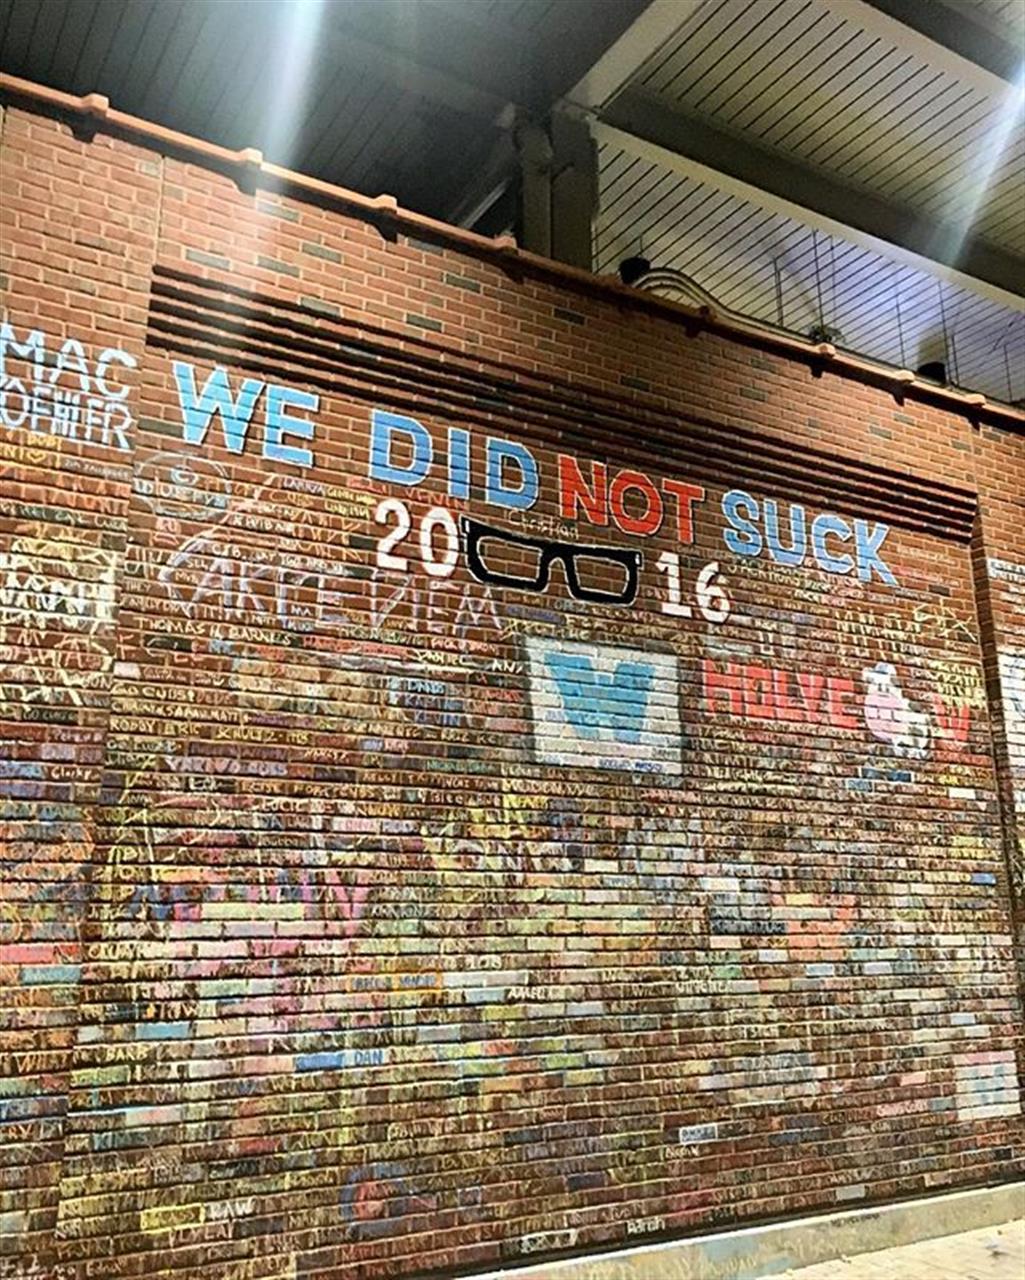 When we're feeling down, we remember we did not suck in 2016 #worldserieschampions #chicagocubs #chicago #hometownpride #leadingrelocal #bairdwarner